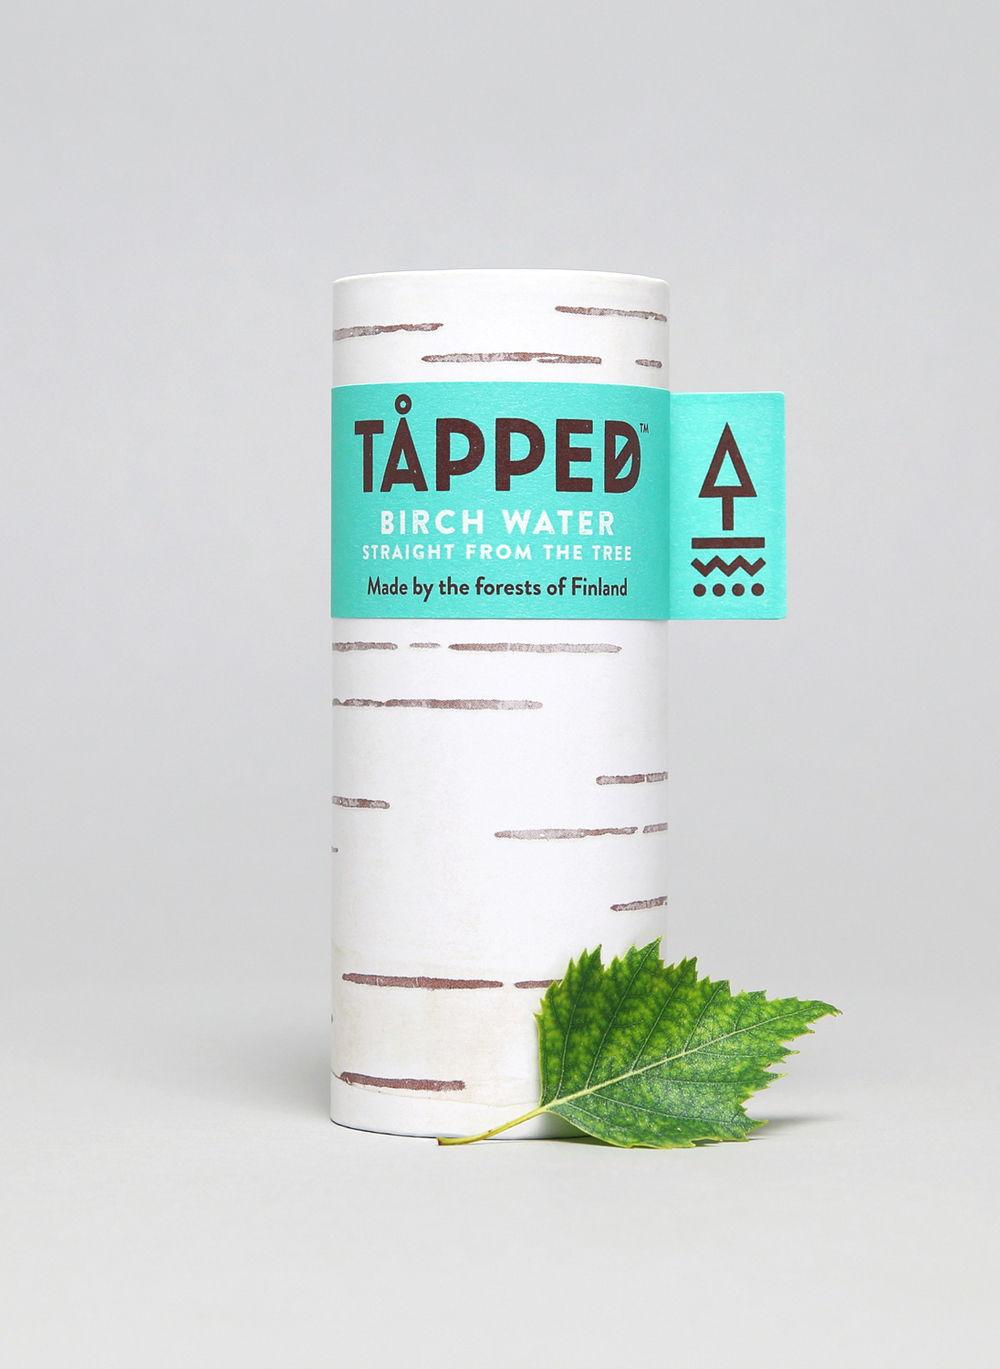 1_TAPPED_Pack_Original.jpg